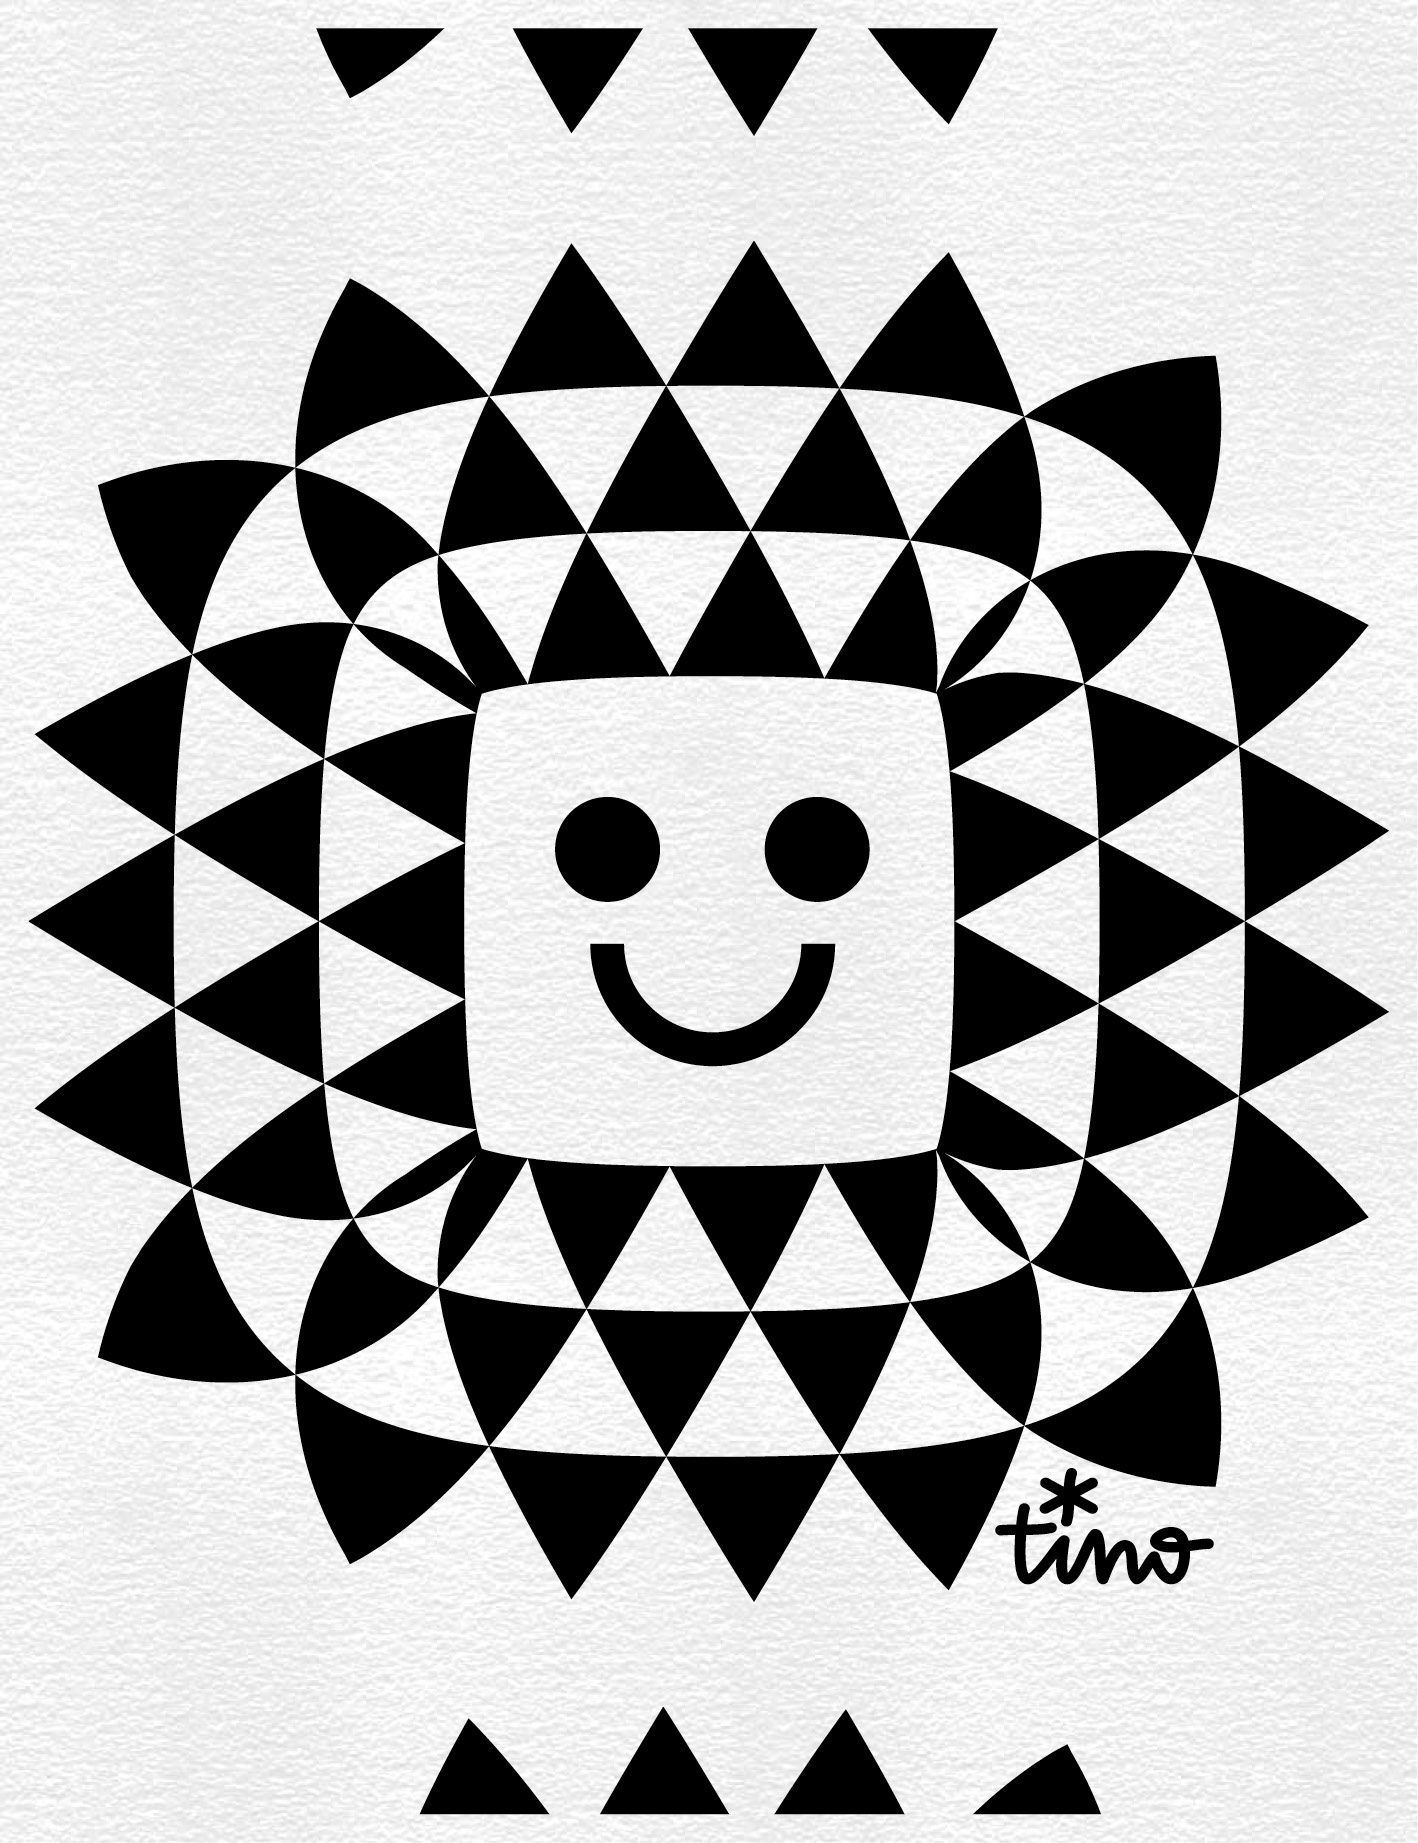 tino-poster-test643